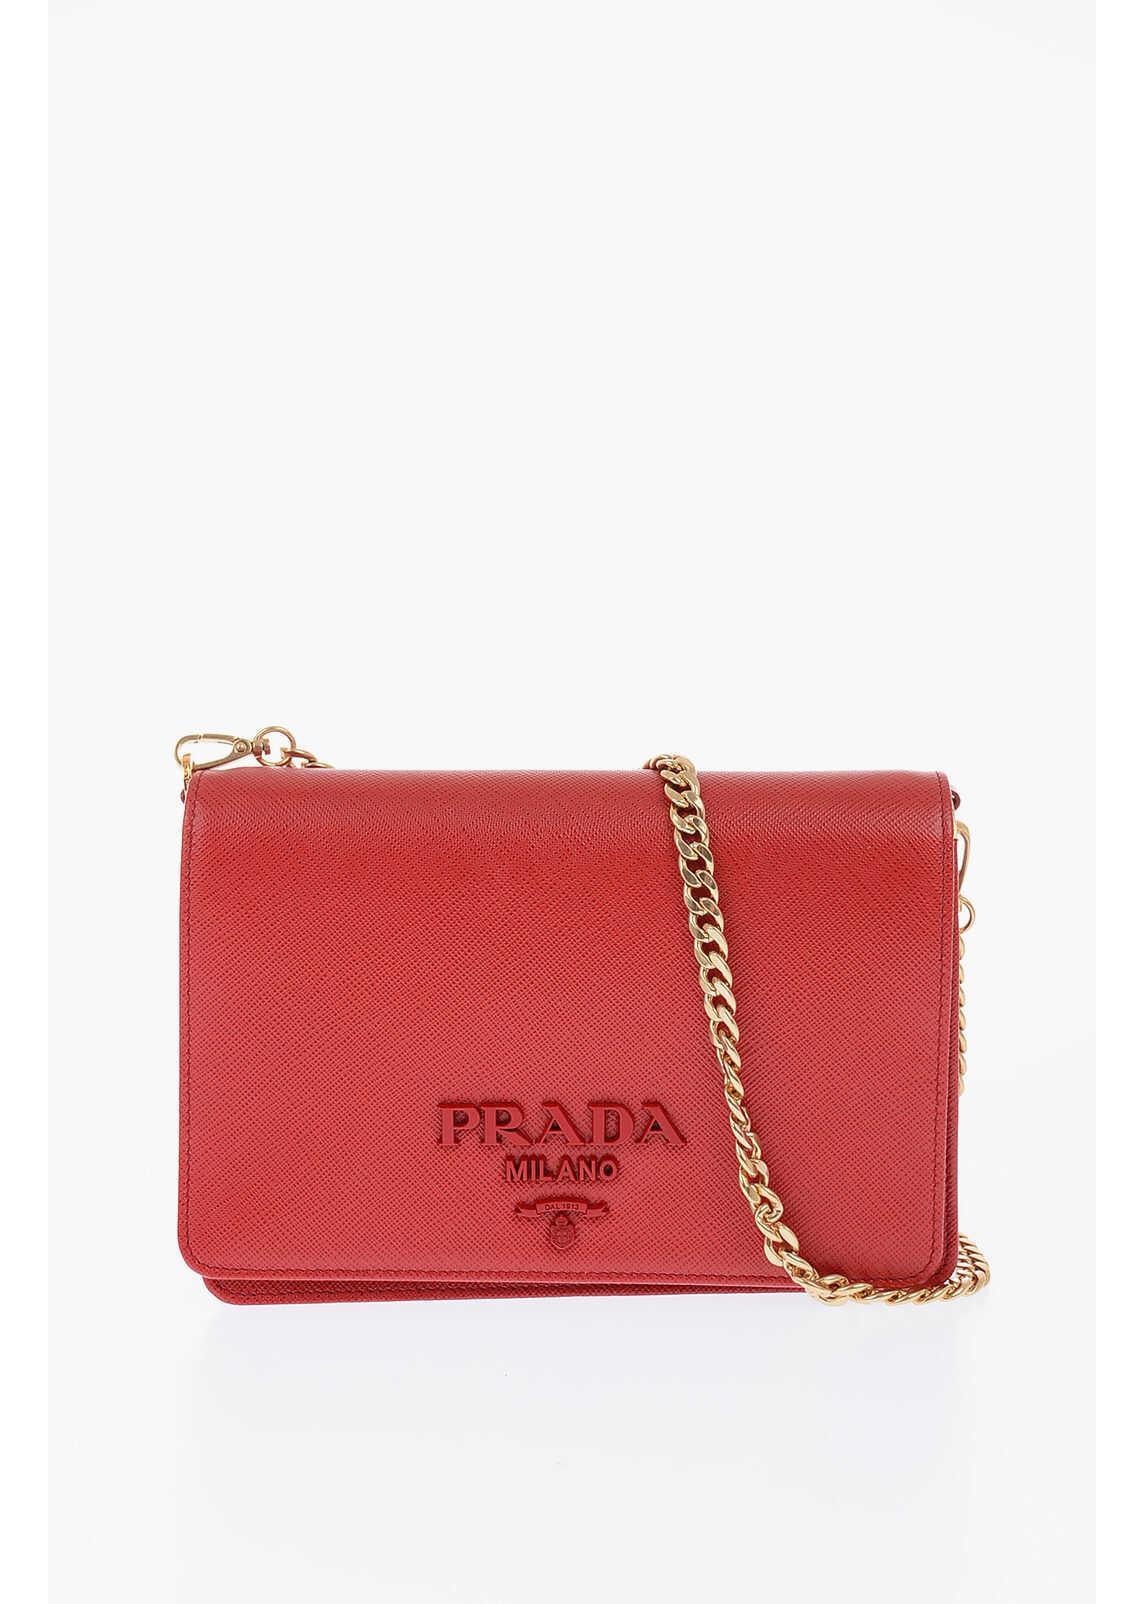 Prada Saffiano Leather Mini Bag with Removable Chain RED imagine b-mall.ro